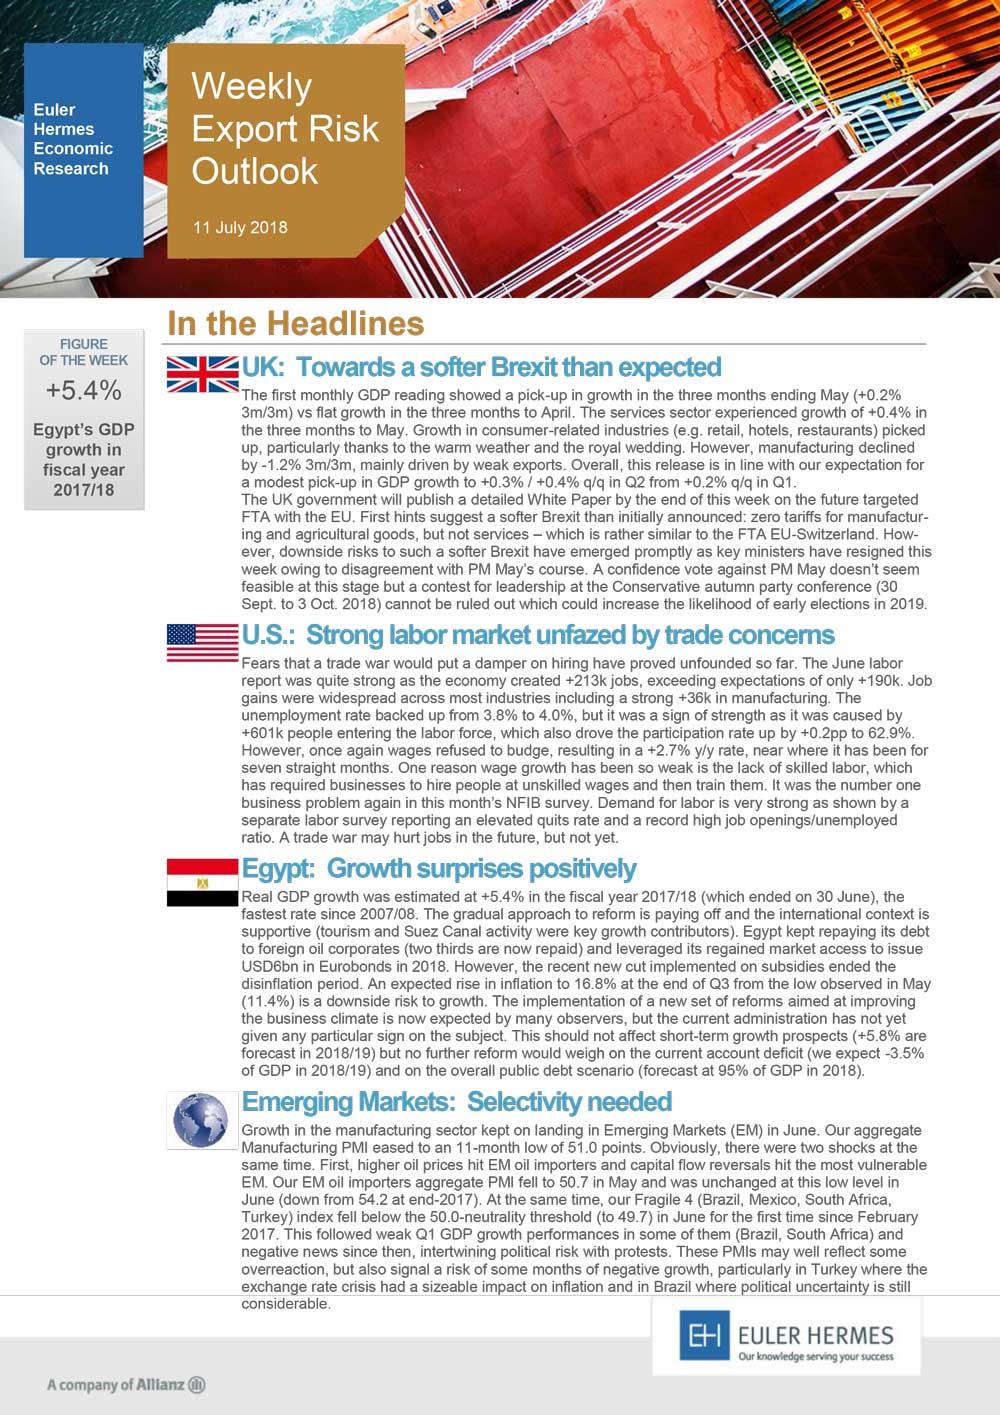 http://www.au-group.com/wordpress/wp-content/uploads/2018/07/uk-us-egypt-emerging-markets-weekly-export-risk-outlook-11July2018.pdf